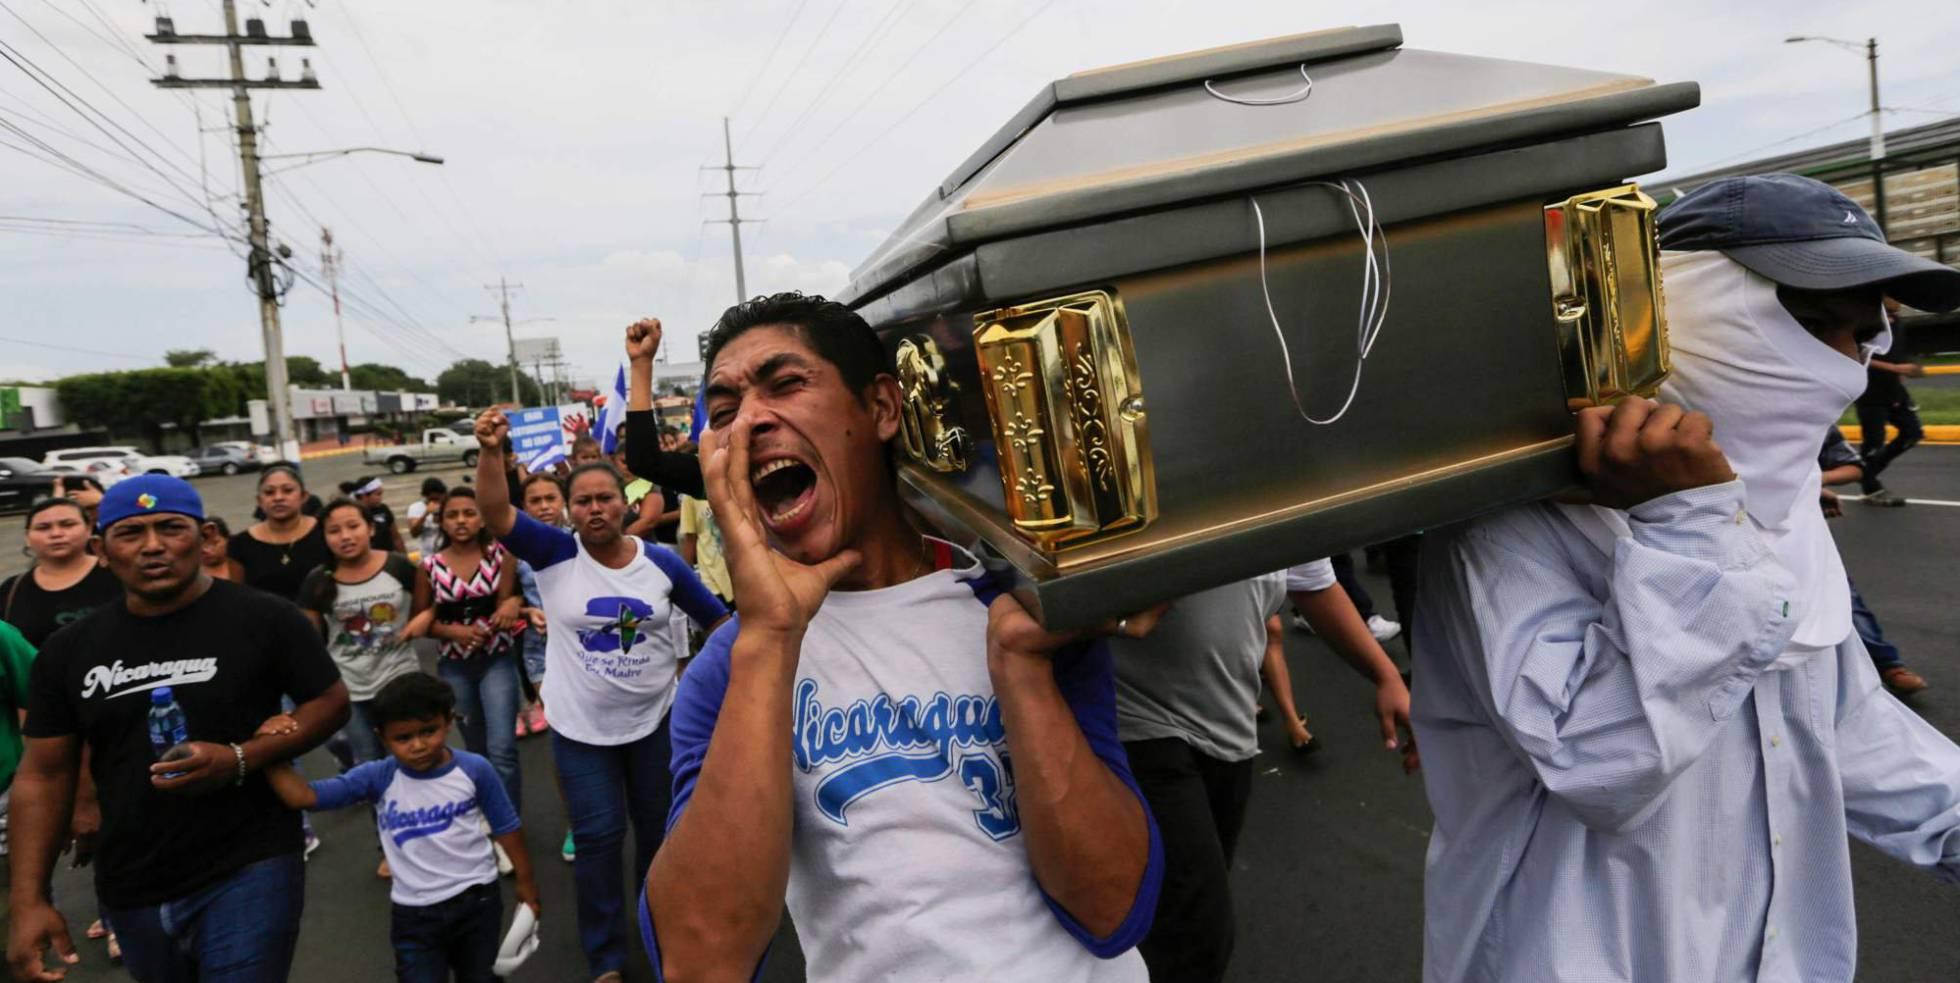 Fotos: Nicaragua: Tres meses de crisis política | Internacional | EL PAÍS